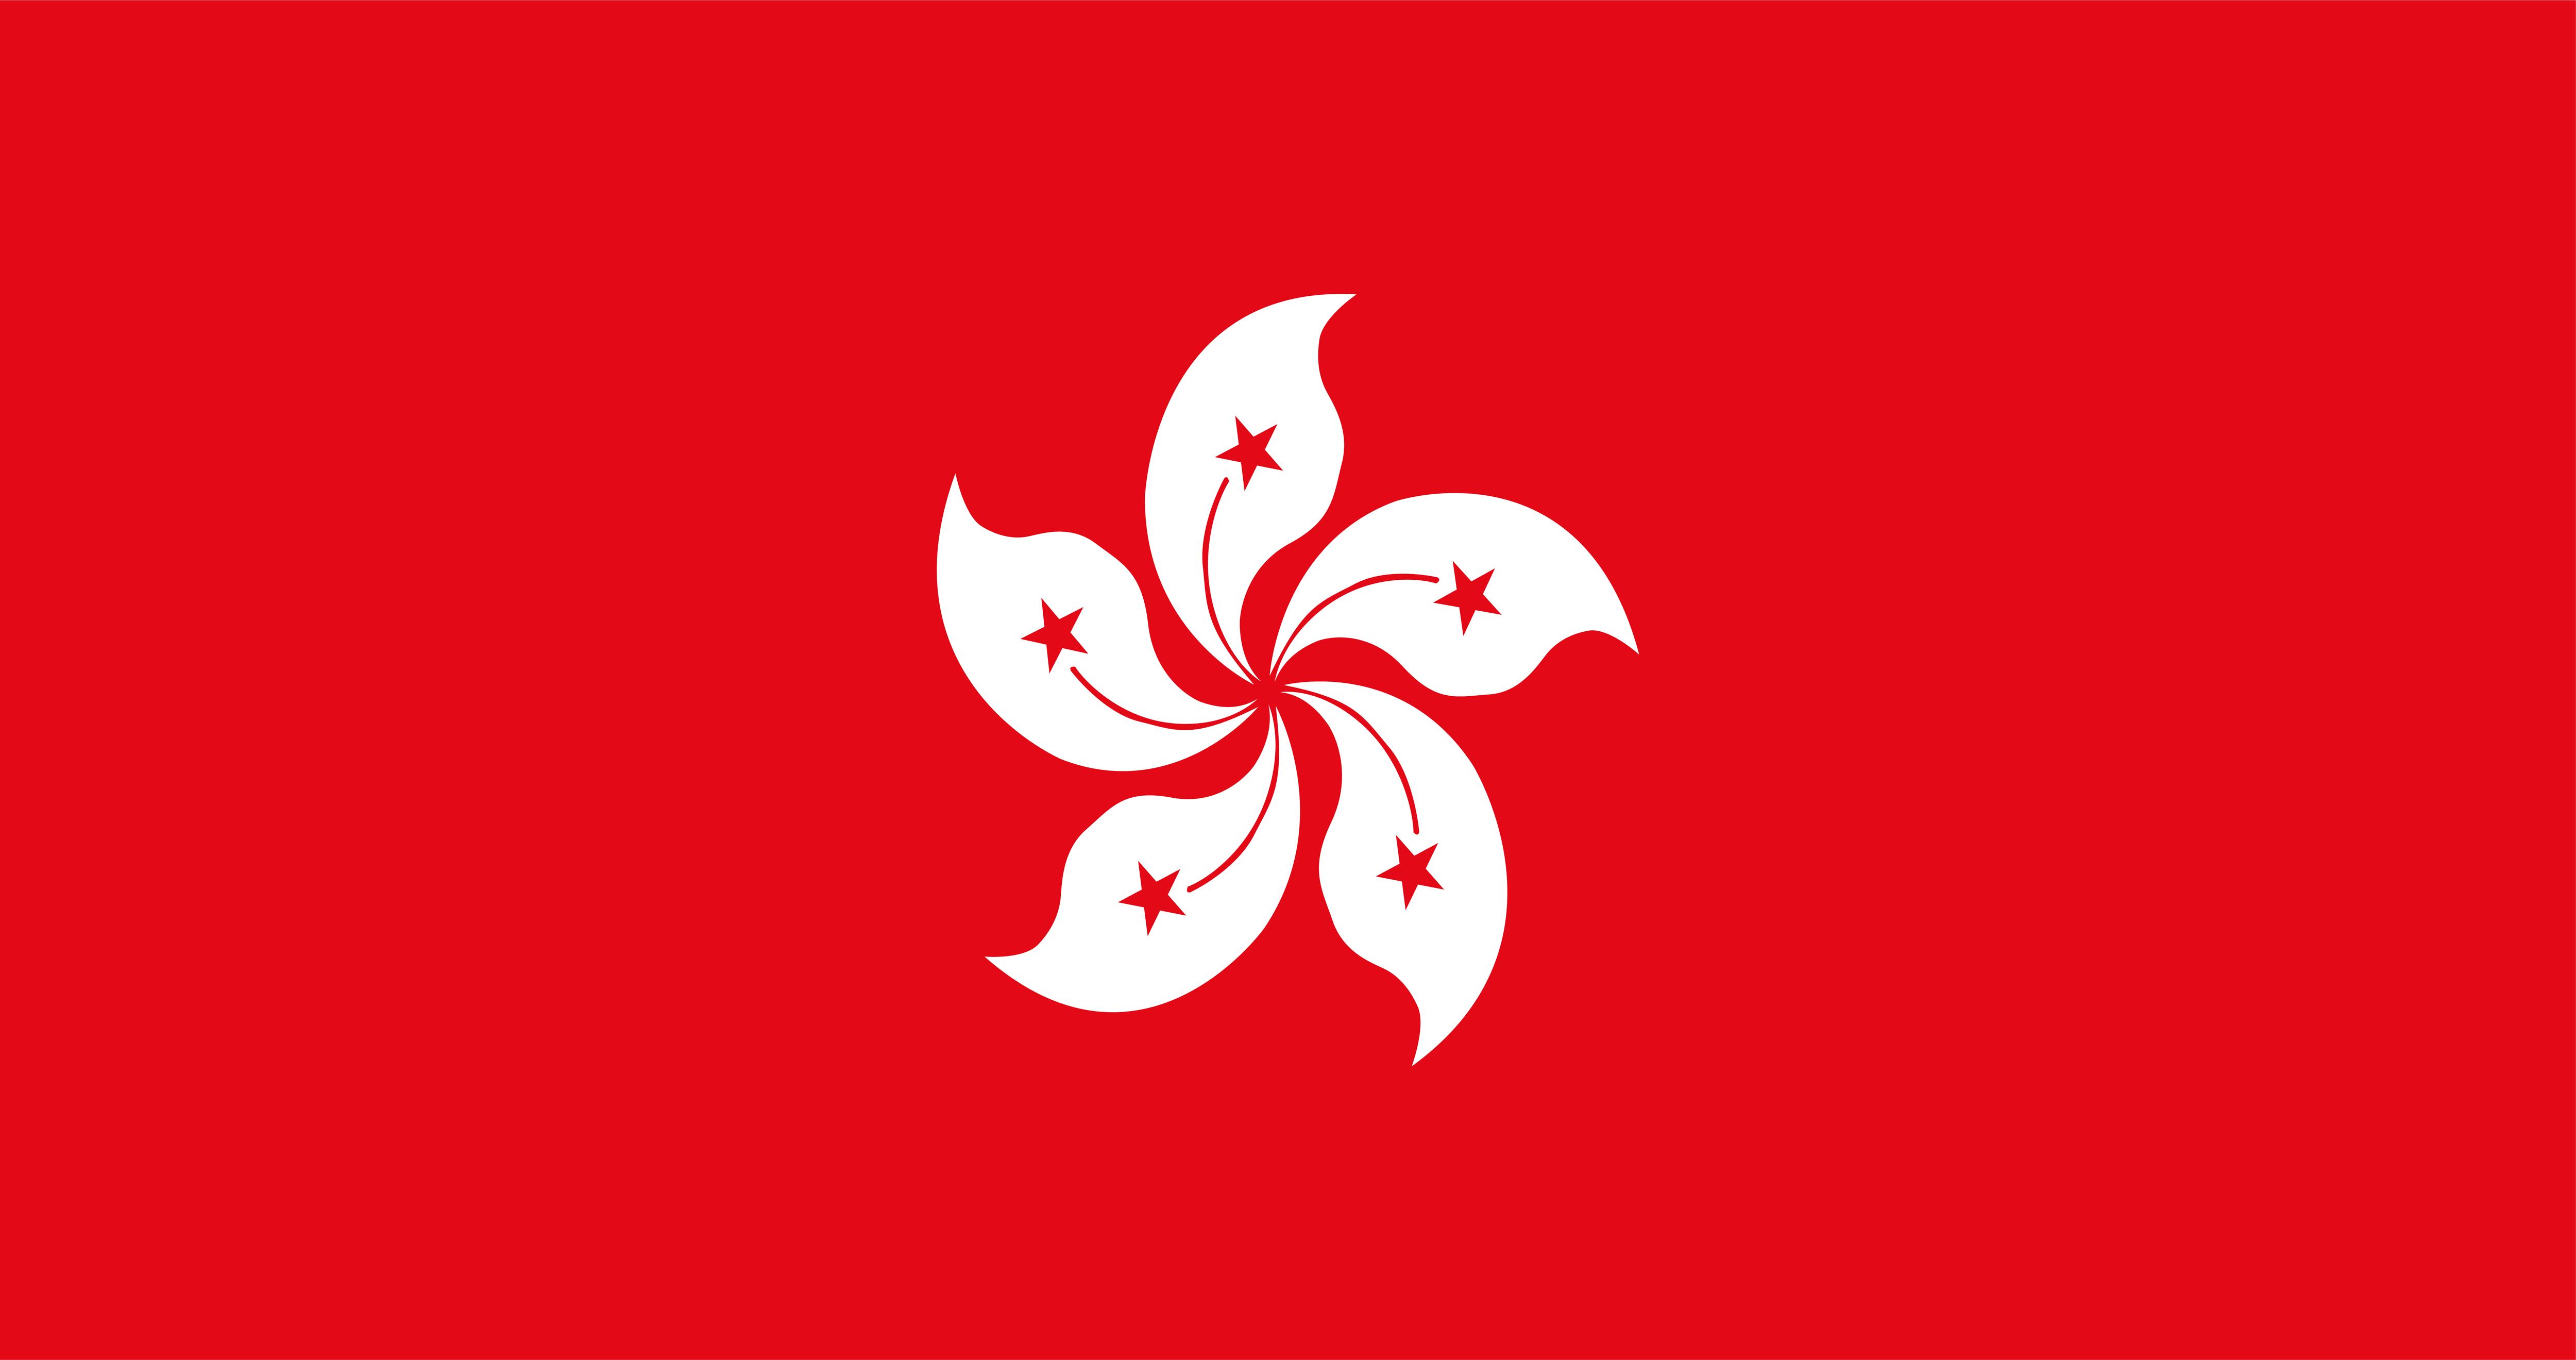 Hong Kong Flag Free Vector Art.